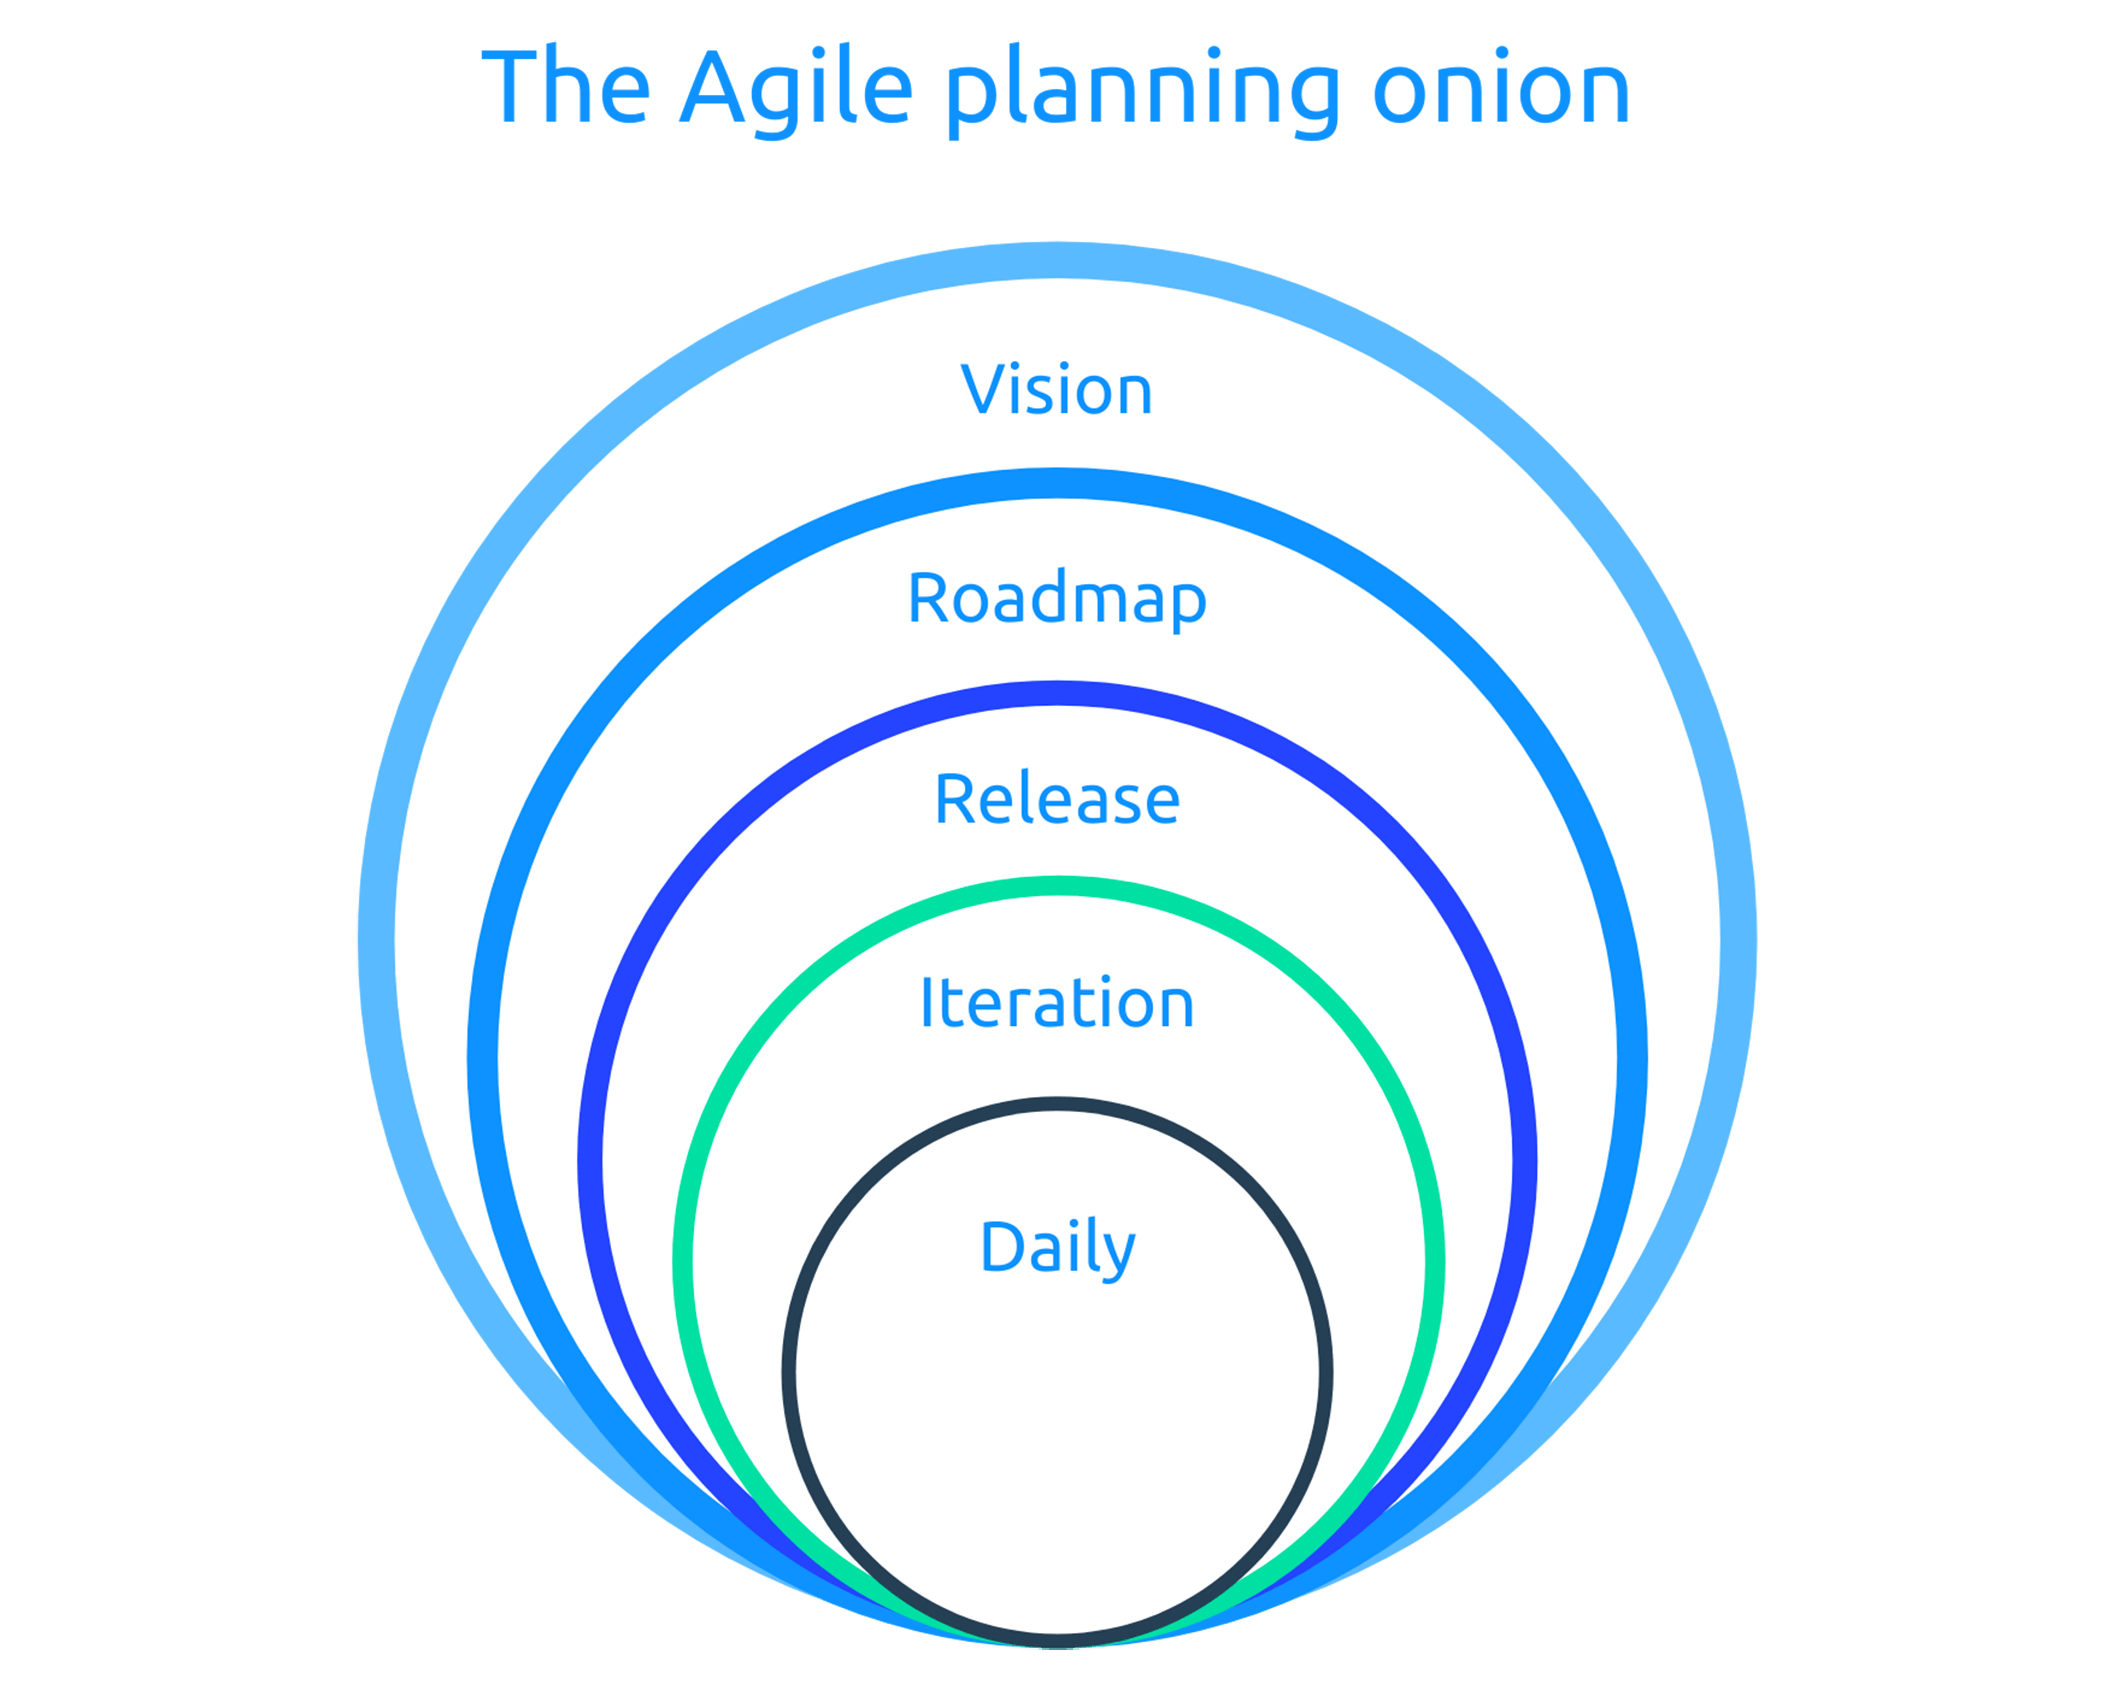 agile planing onion